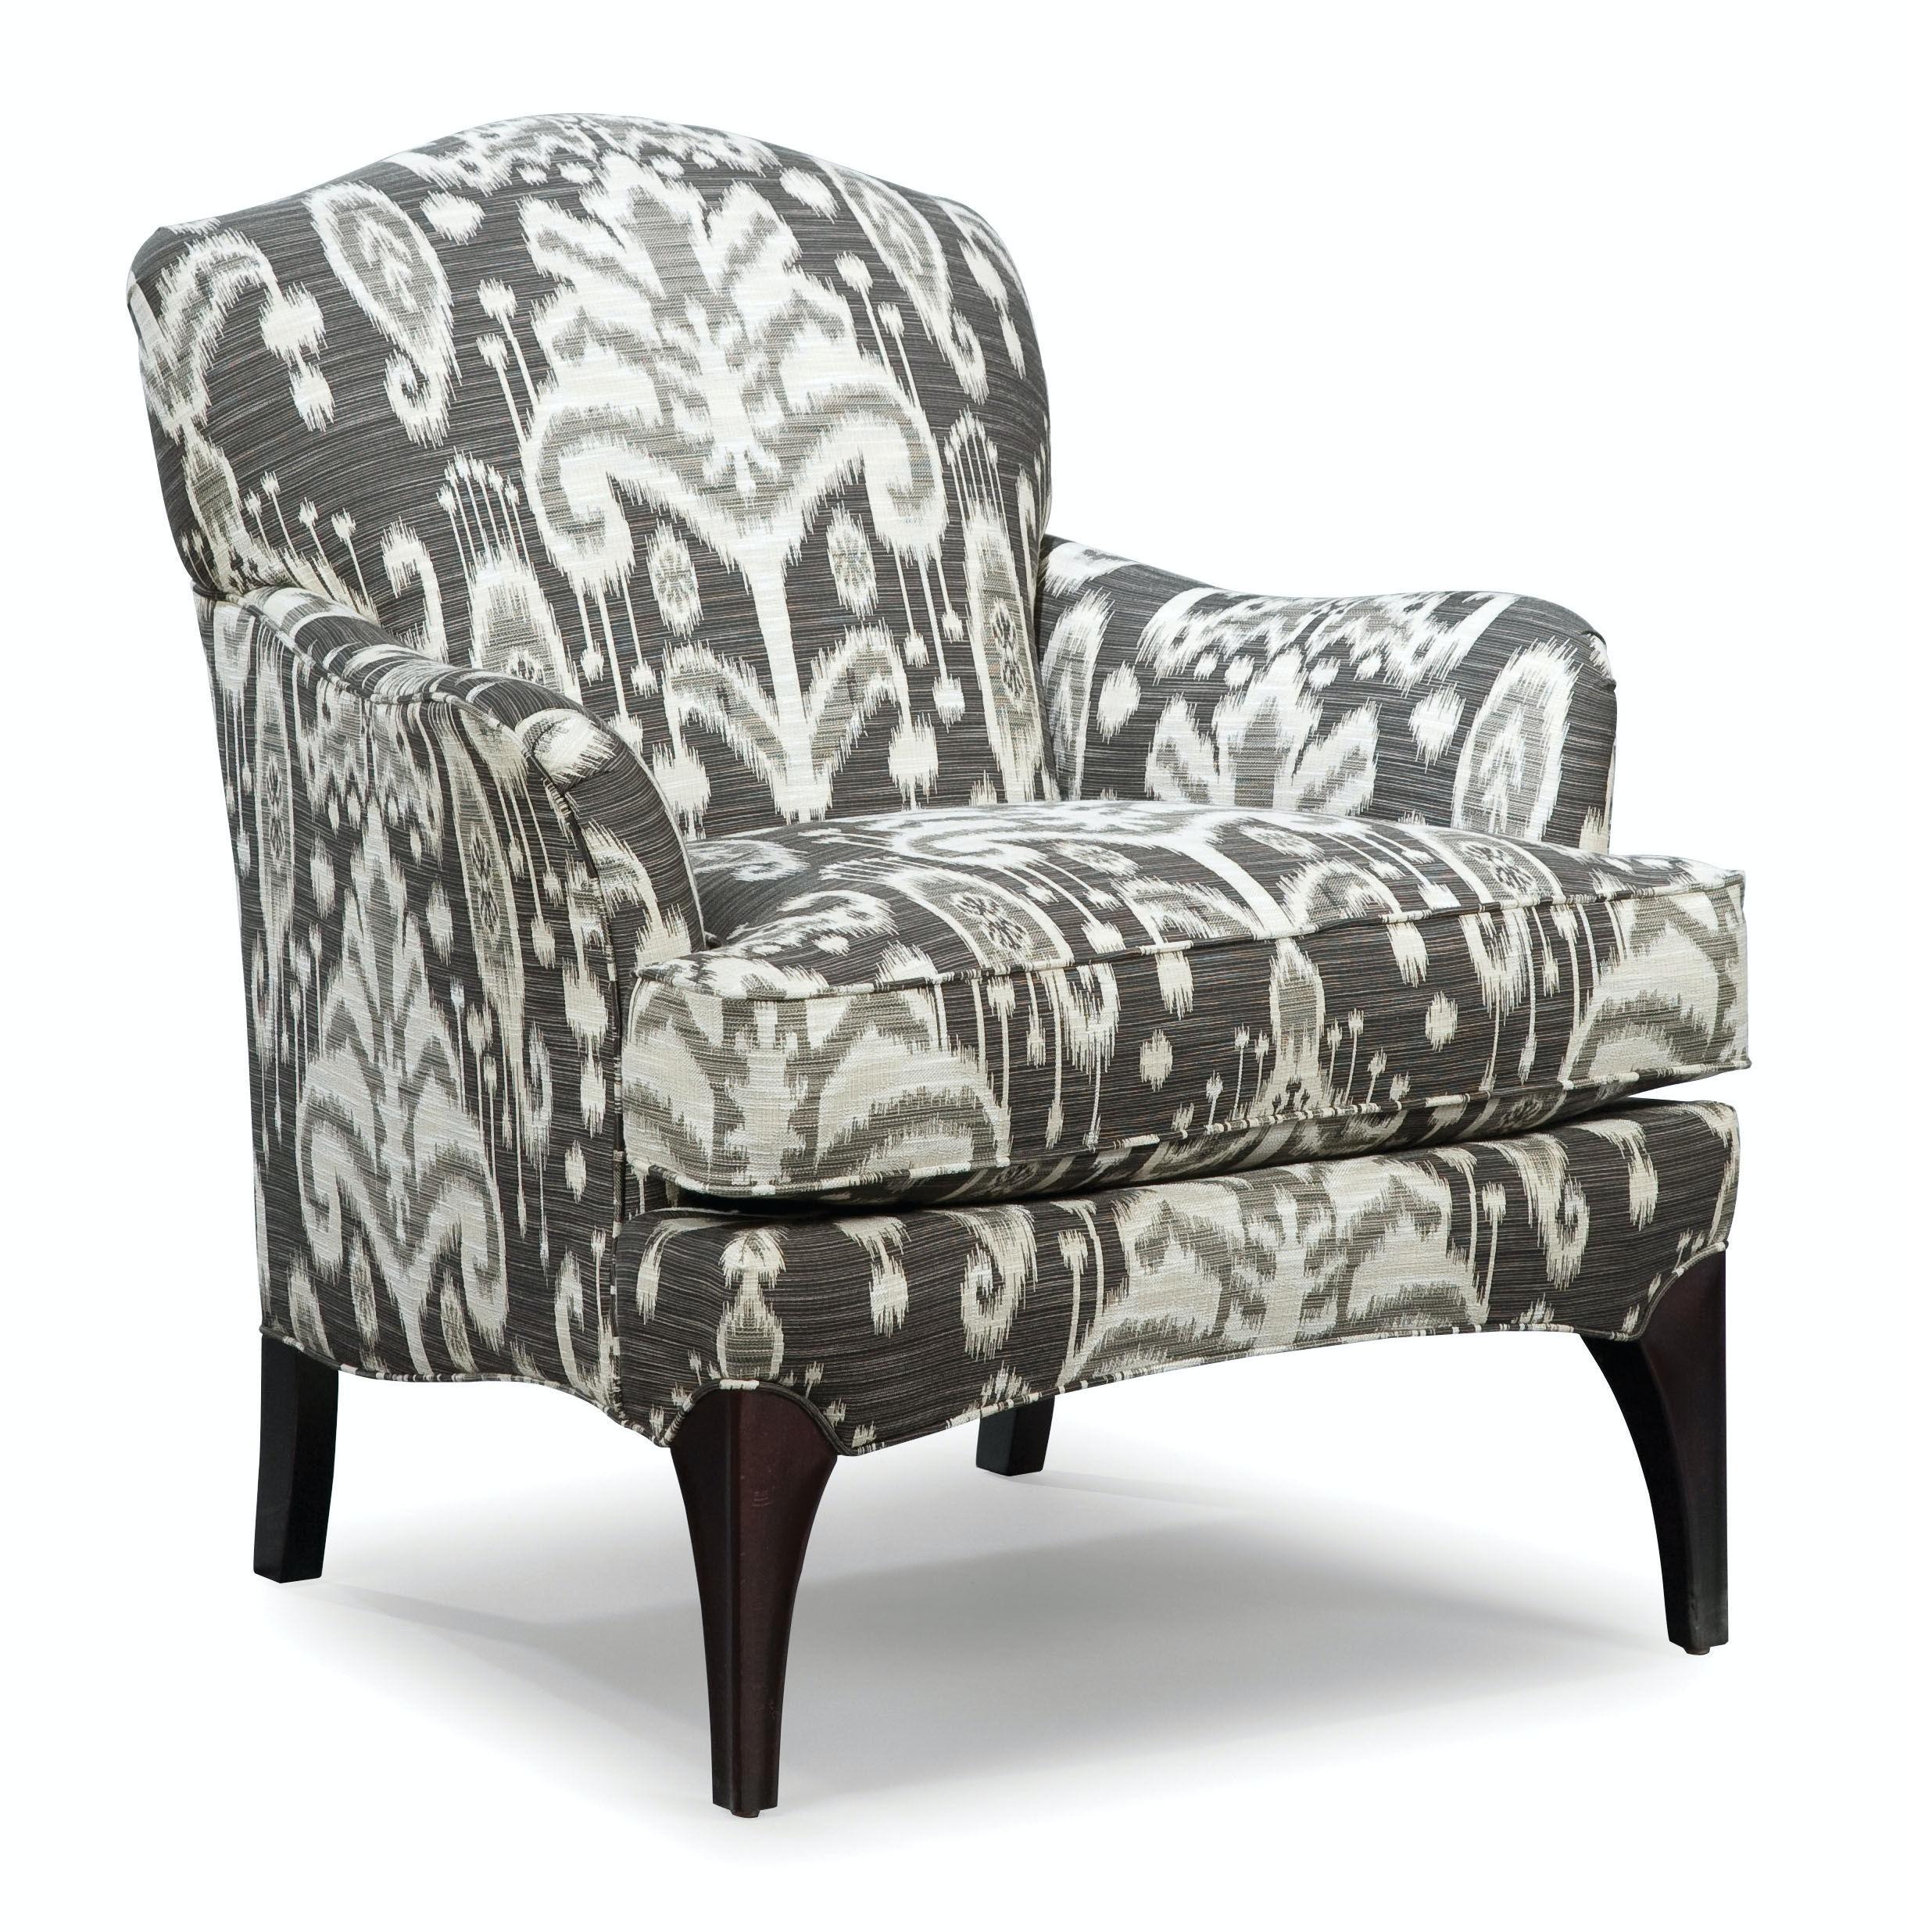 Fairfield Chair Company Lounge Chair 5729 01